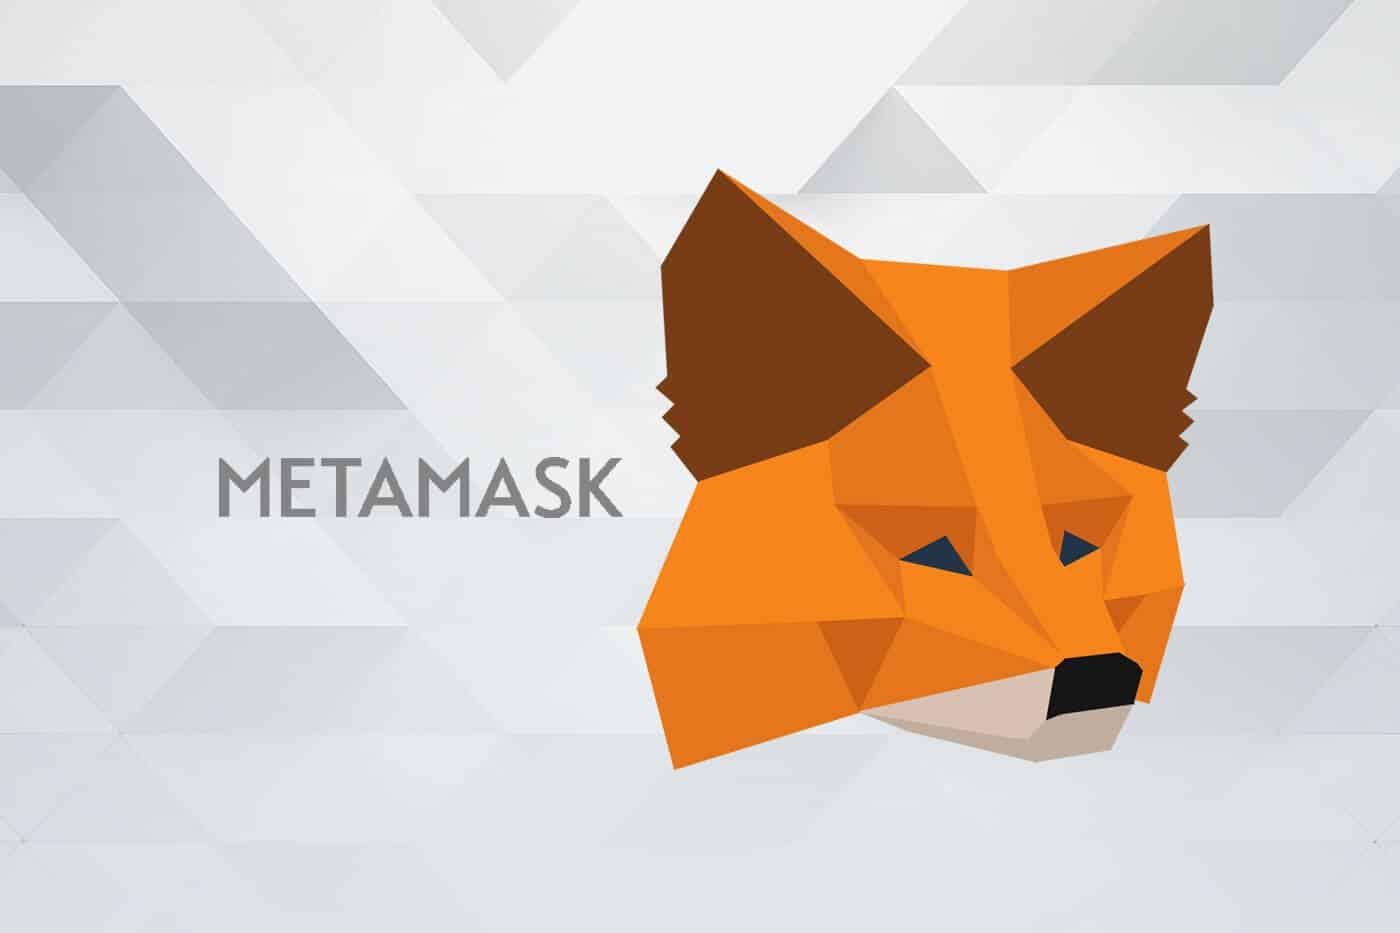 Ethereum's MetaMask Reaches 1 Million User Milestone